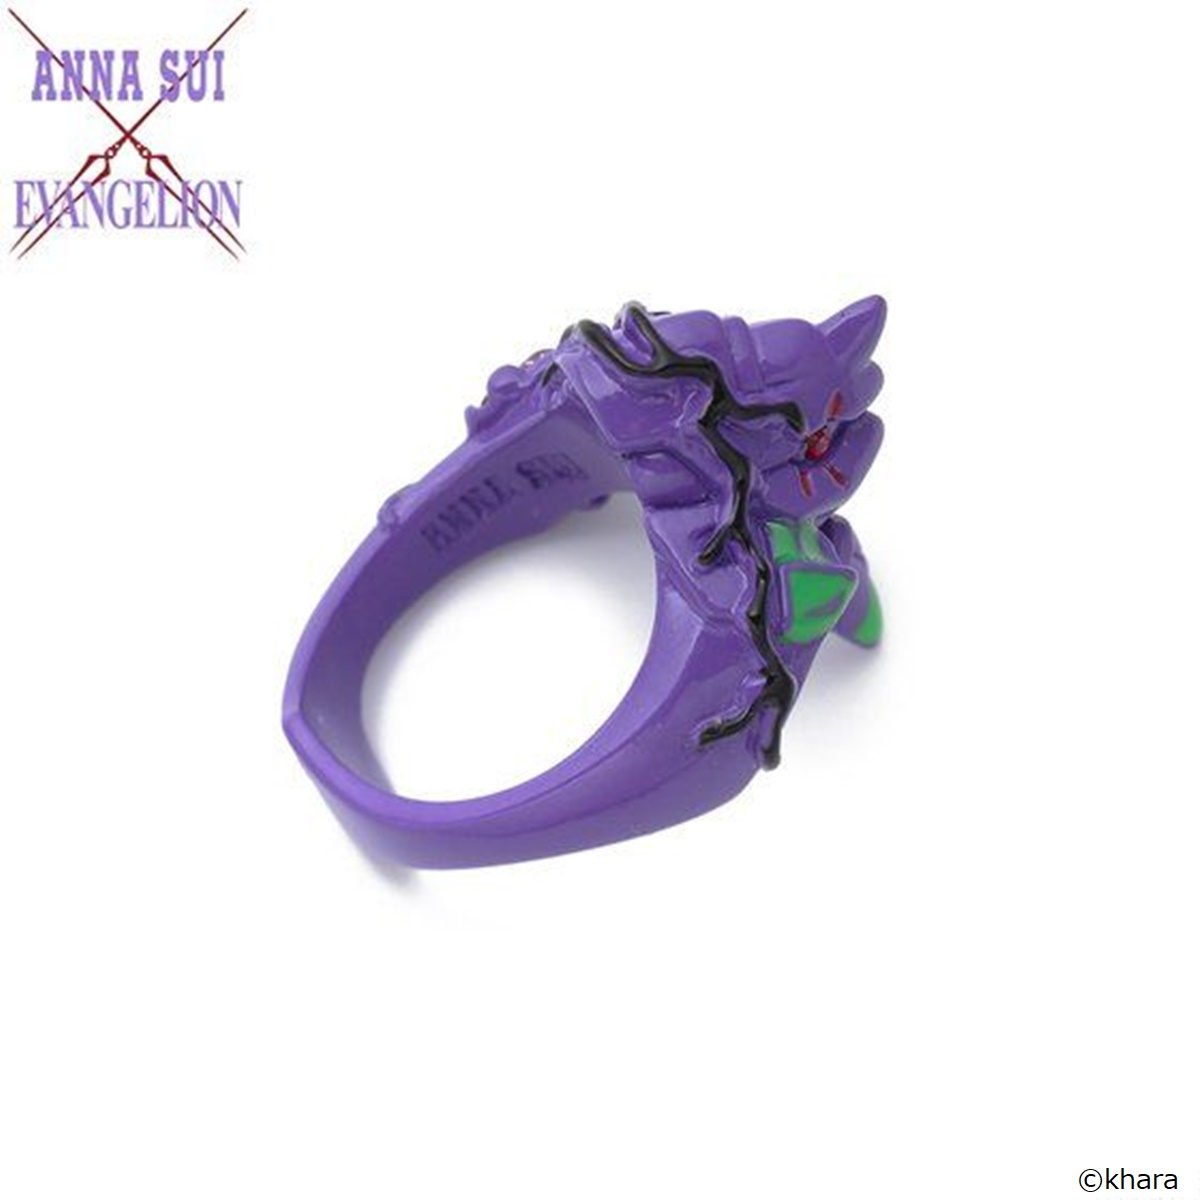 Evangelion: EVA-01 Ring—Evangelion/Anna Sui Collaboration  [Dec 2021 Delivery]